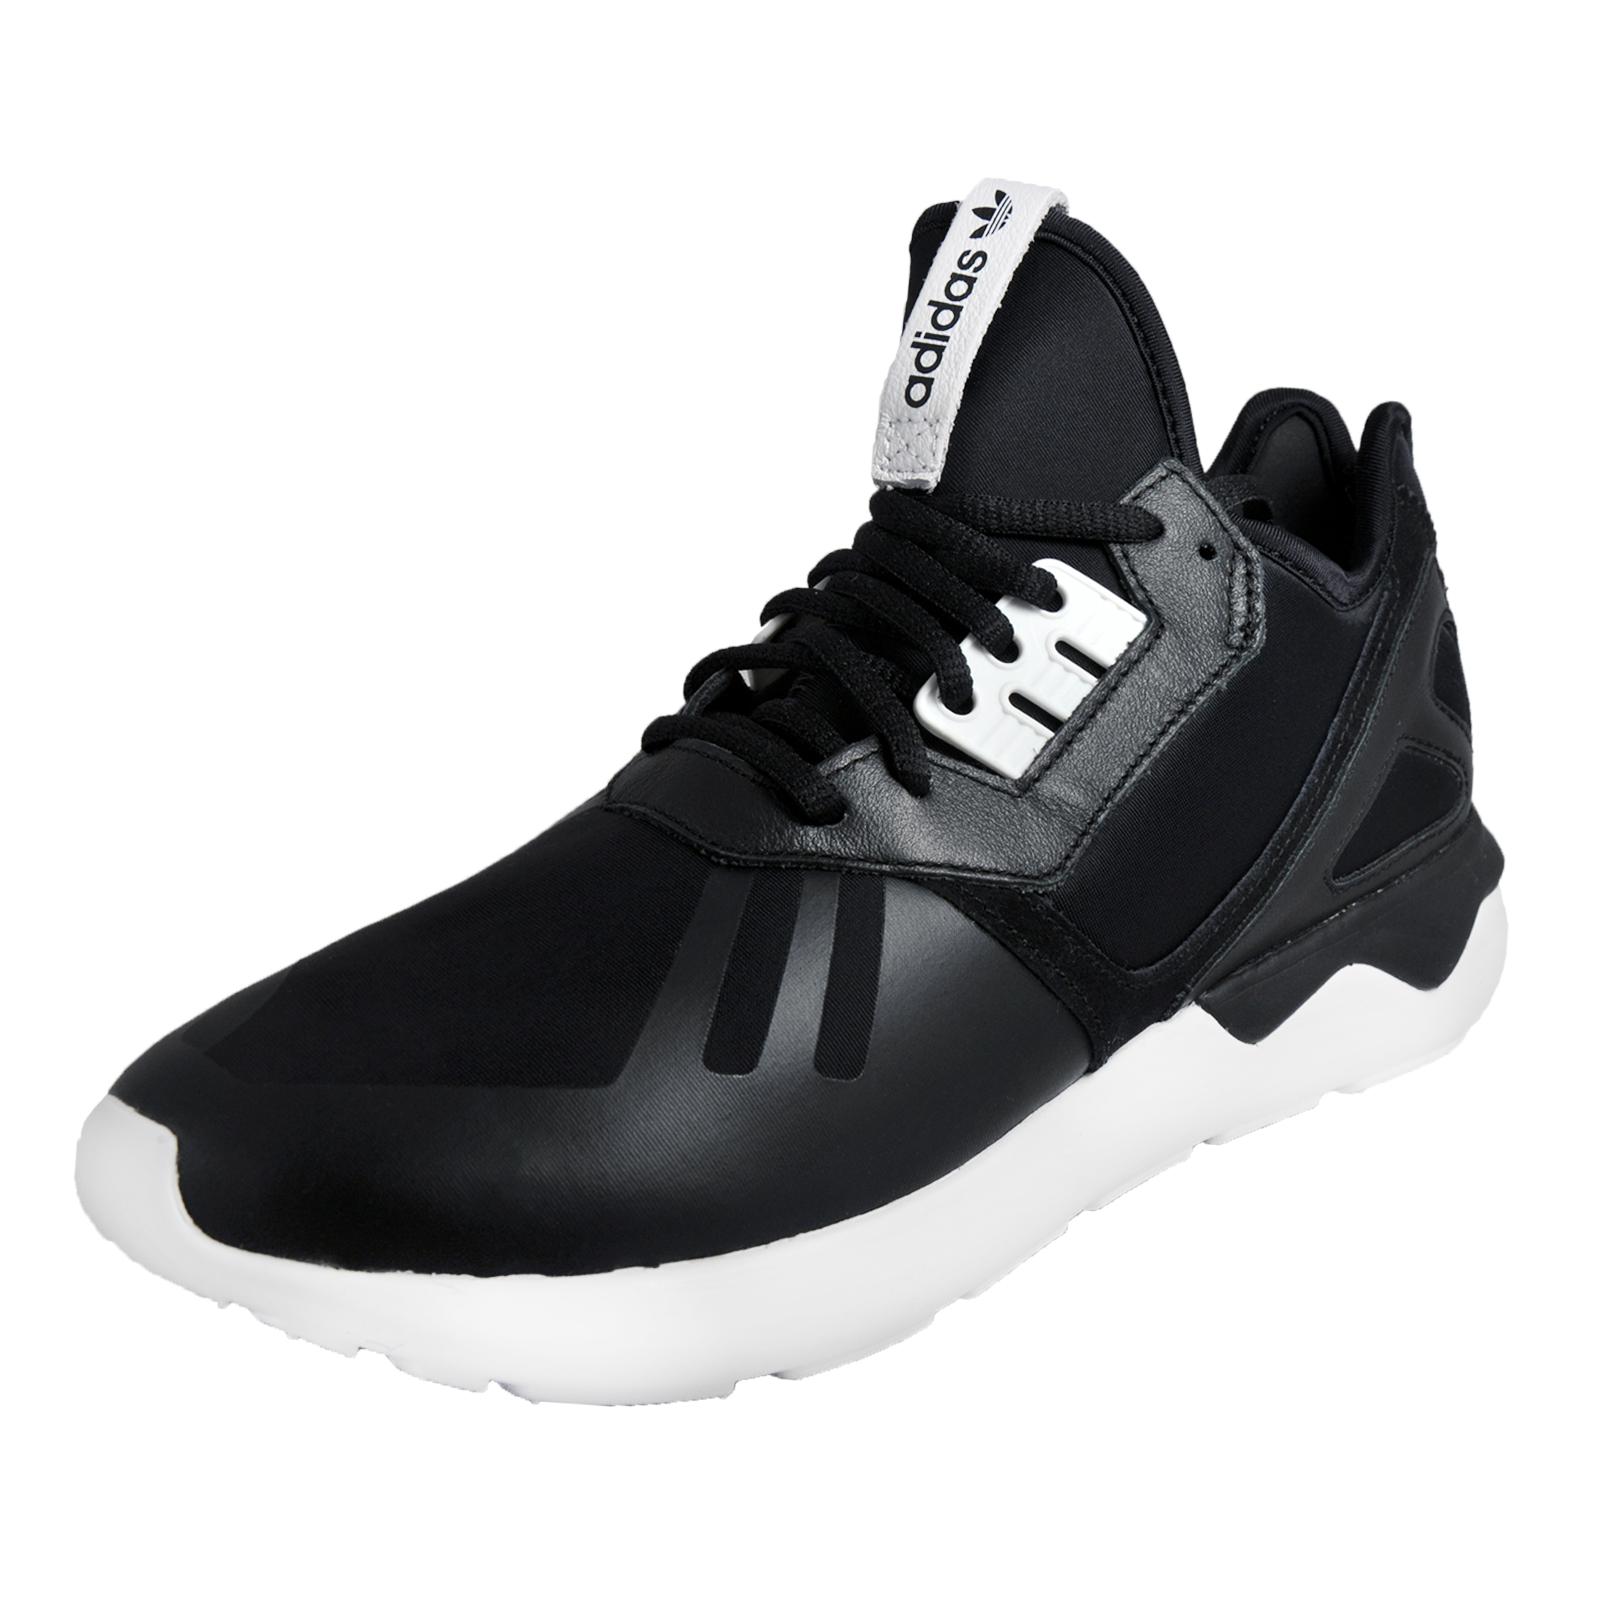 24a354b58 Details about Adidas Originals Tubular Runner Mens Classic Casual Retro  Trainers Black